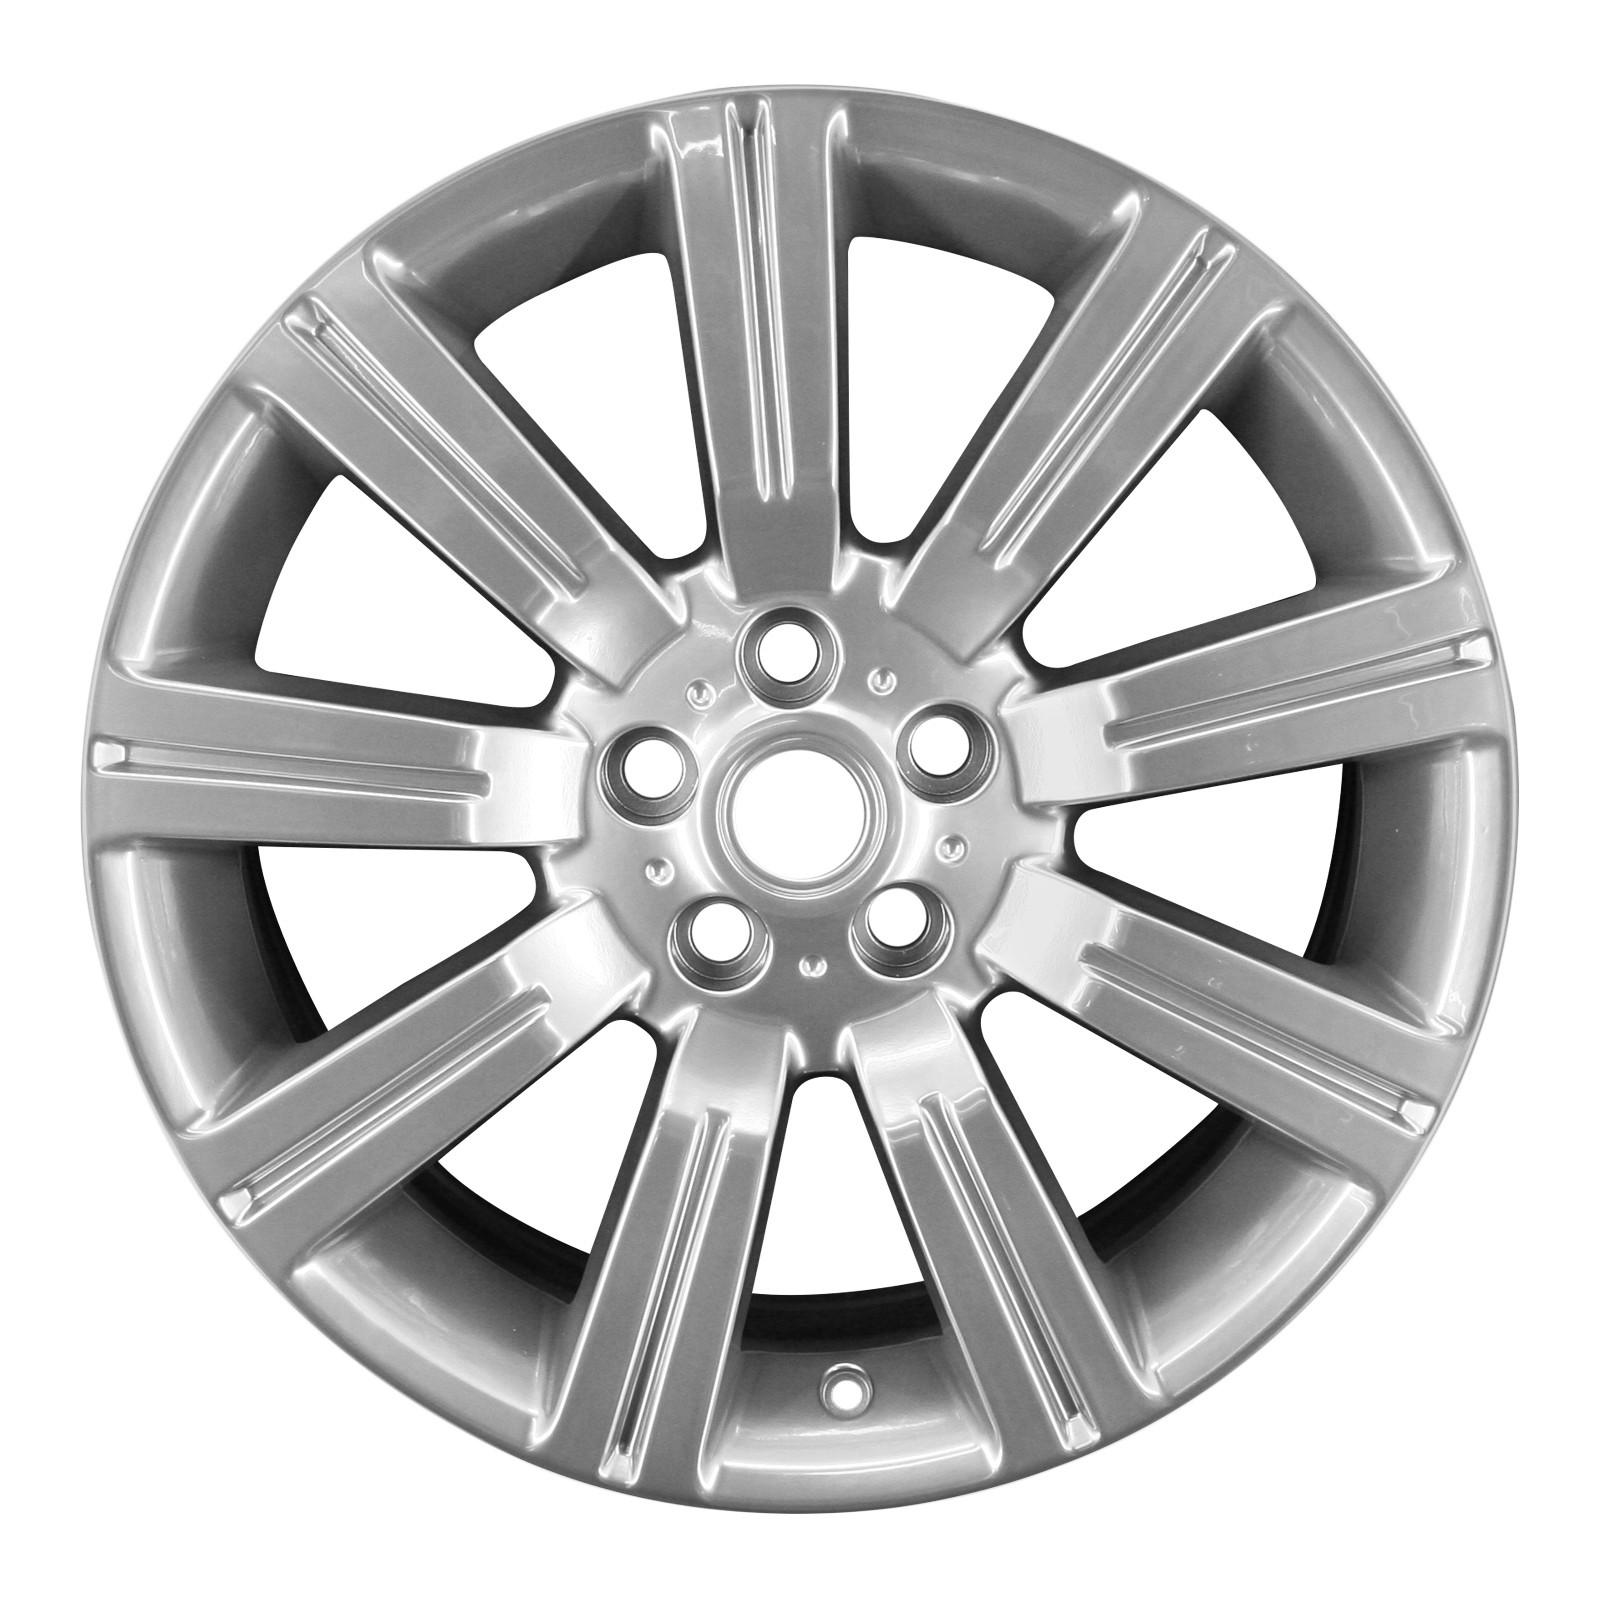 Колесный диск R20 Stormer Titan Silver для Range Rover Sport 2010-2014